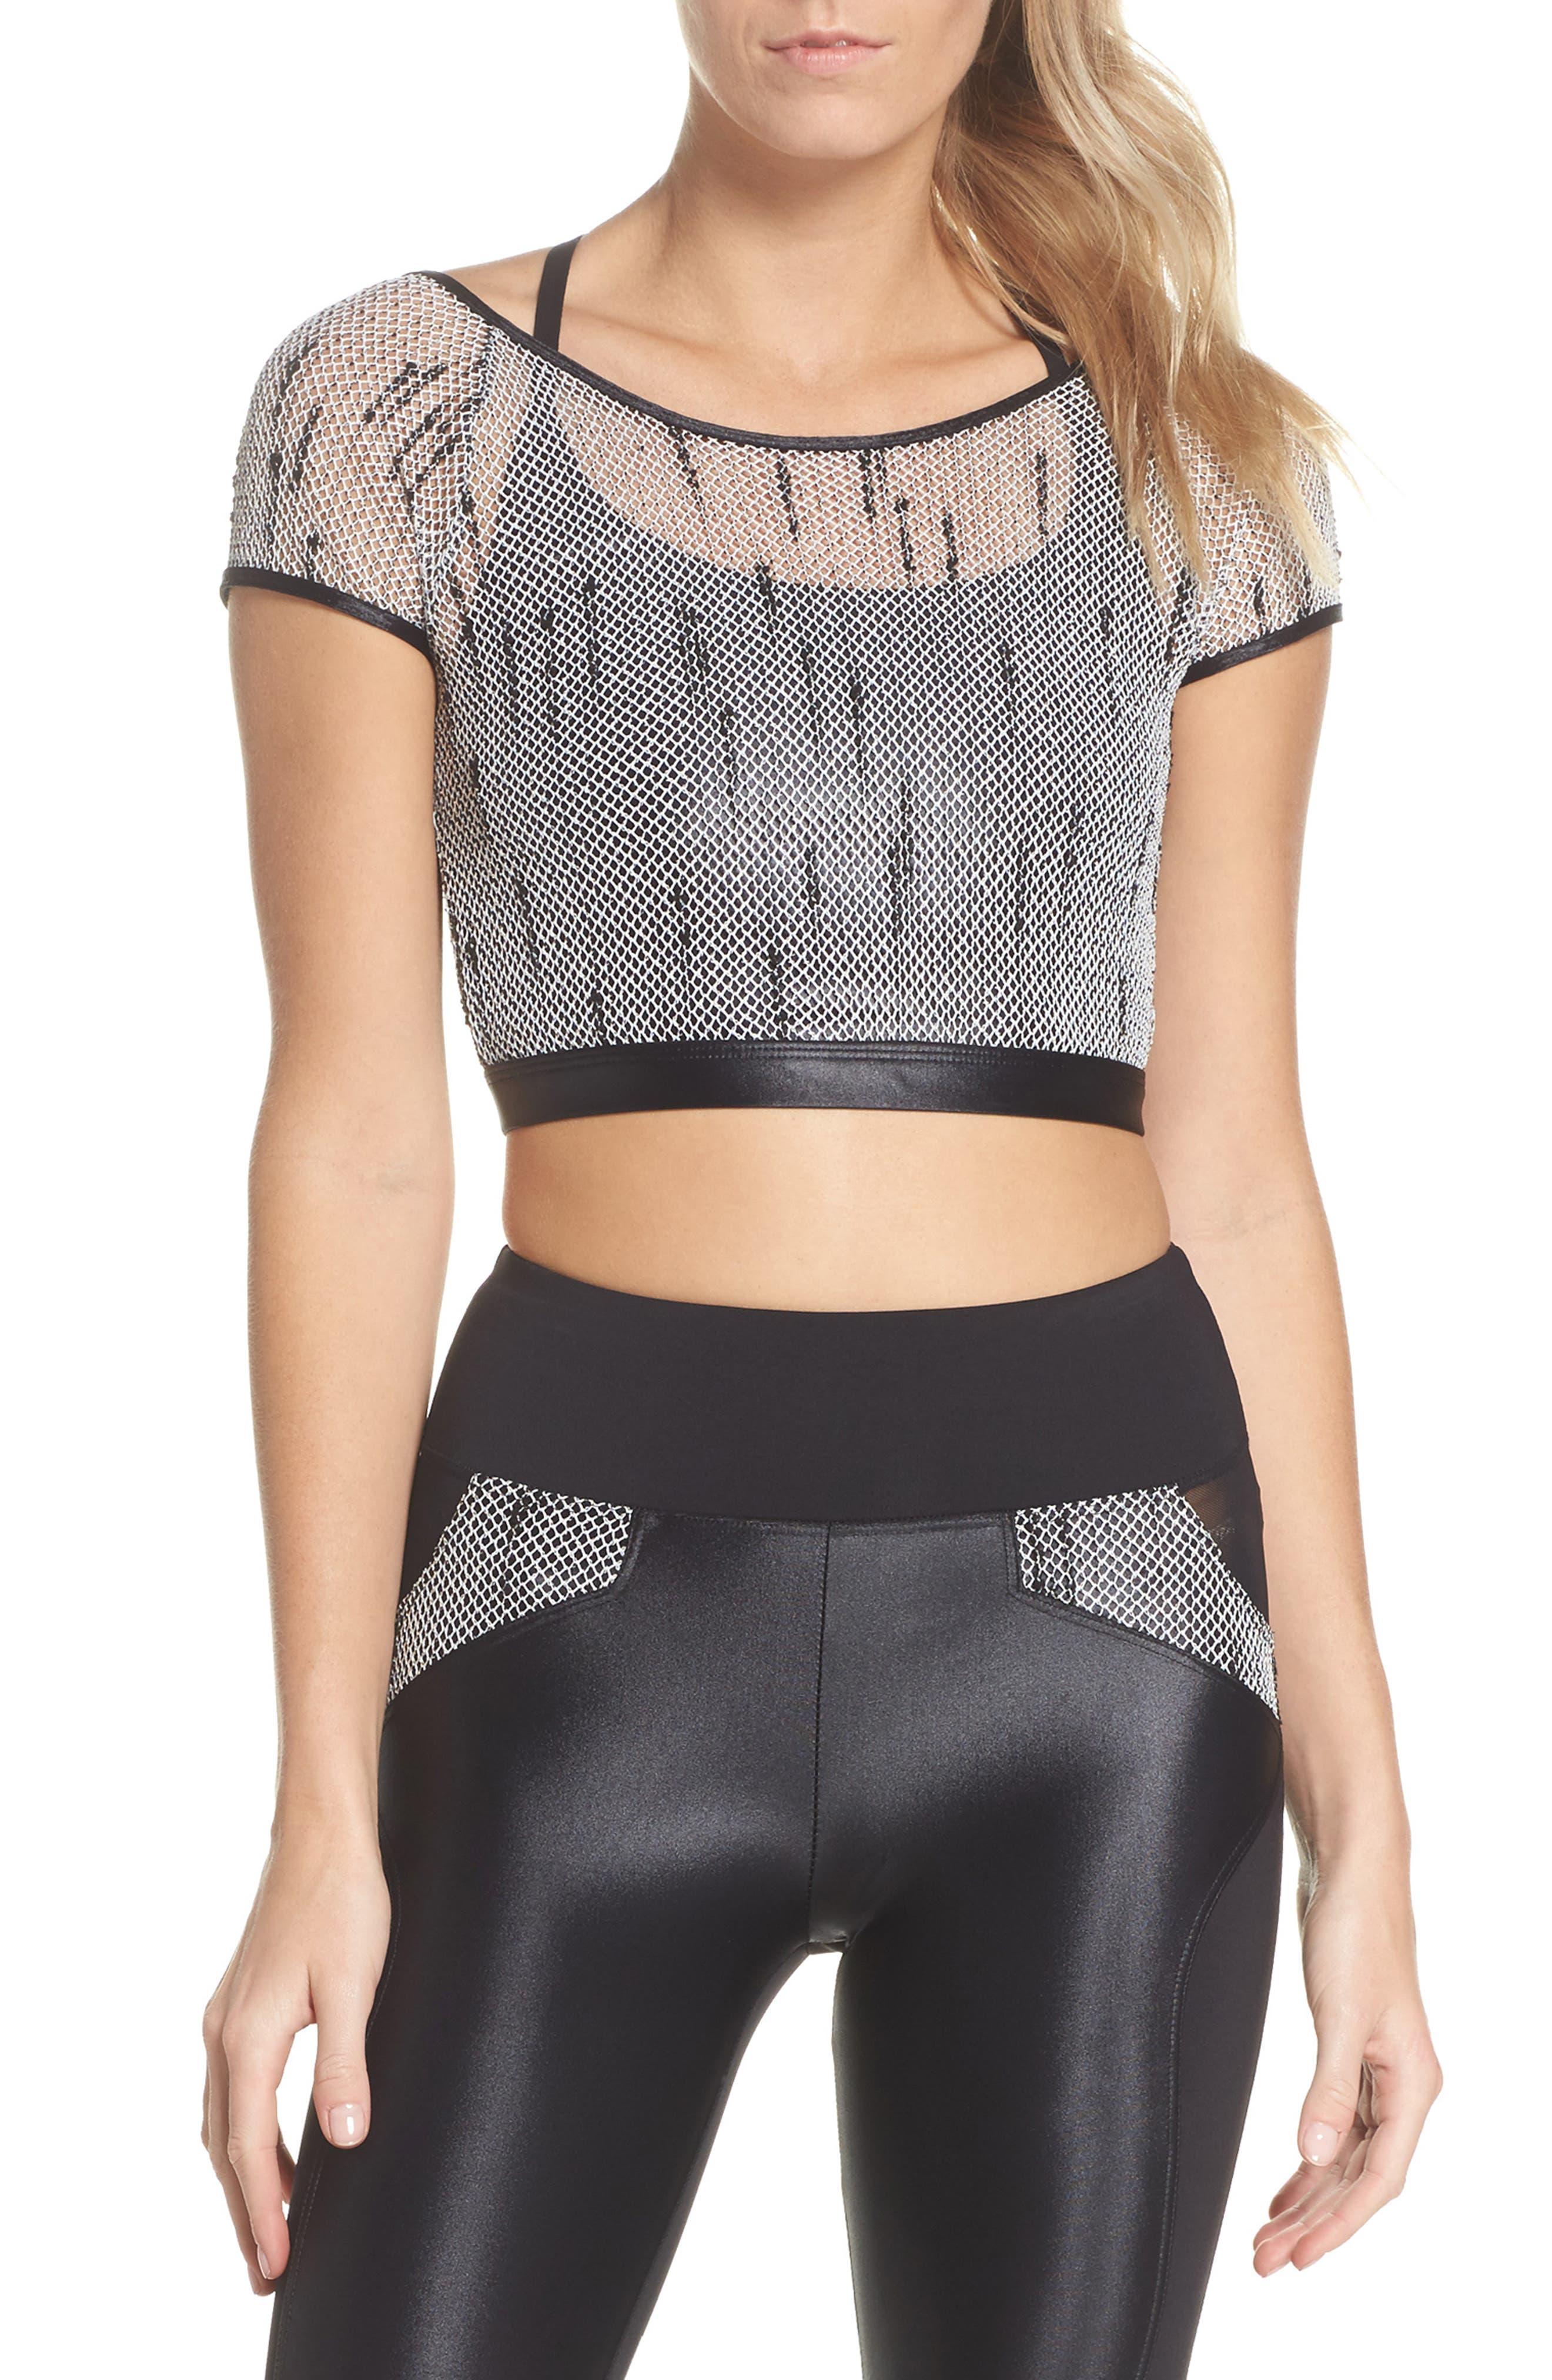 Combination Sports Bra,                         Main,                         color, Black/ Weave